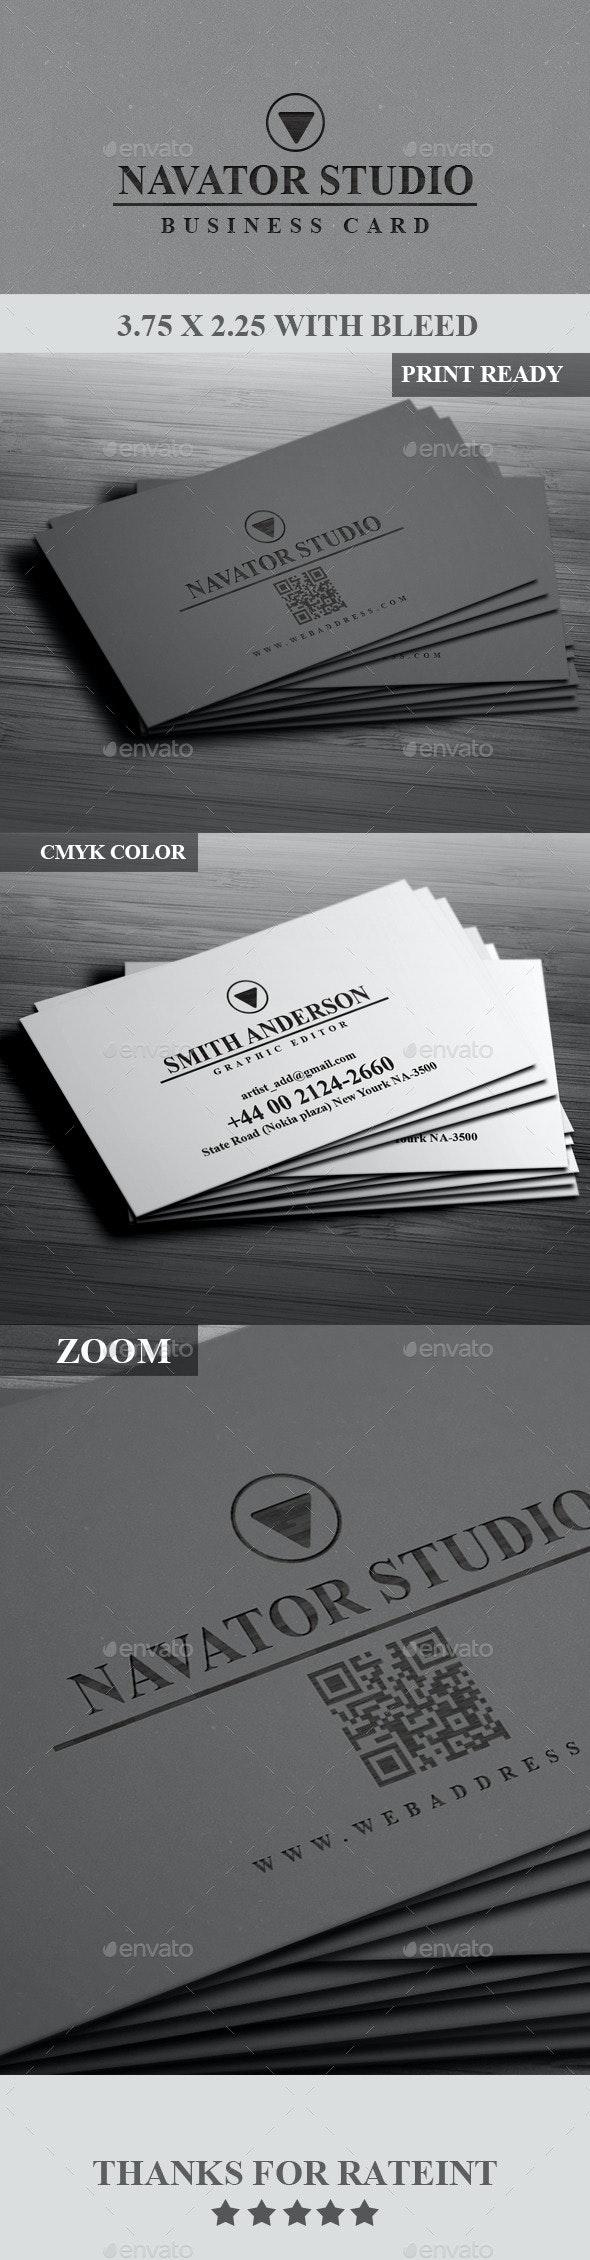 Navaor Studio Business Card - Corporate Business Cards